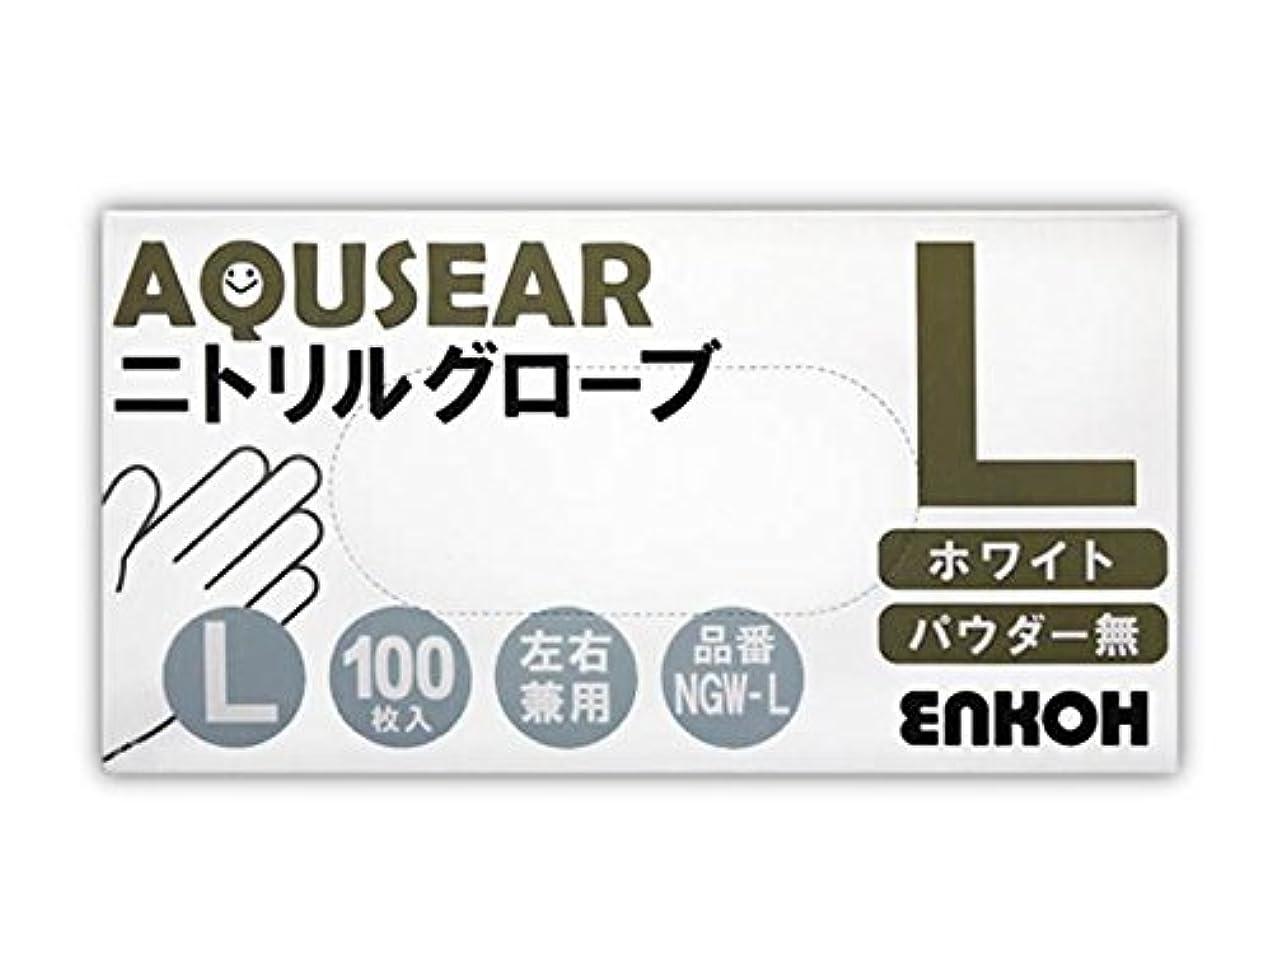 AQUSEAR ニトリルグローブ パウダー無 L ホワイト NGW-L 1ケース2,000枚(100枚箱入×20箱)